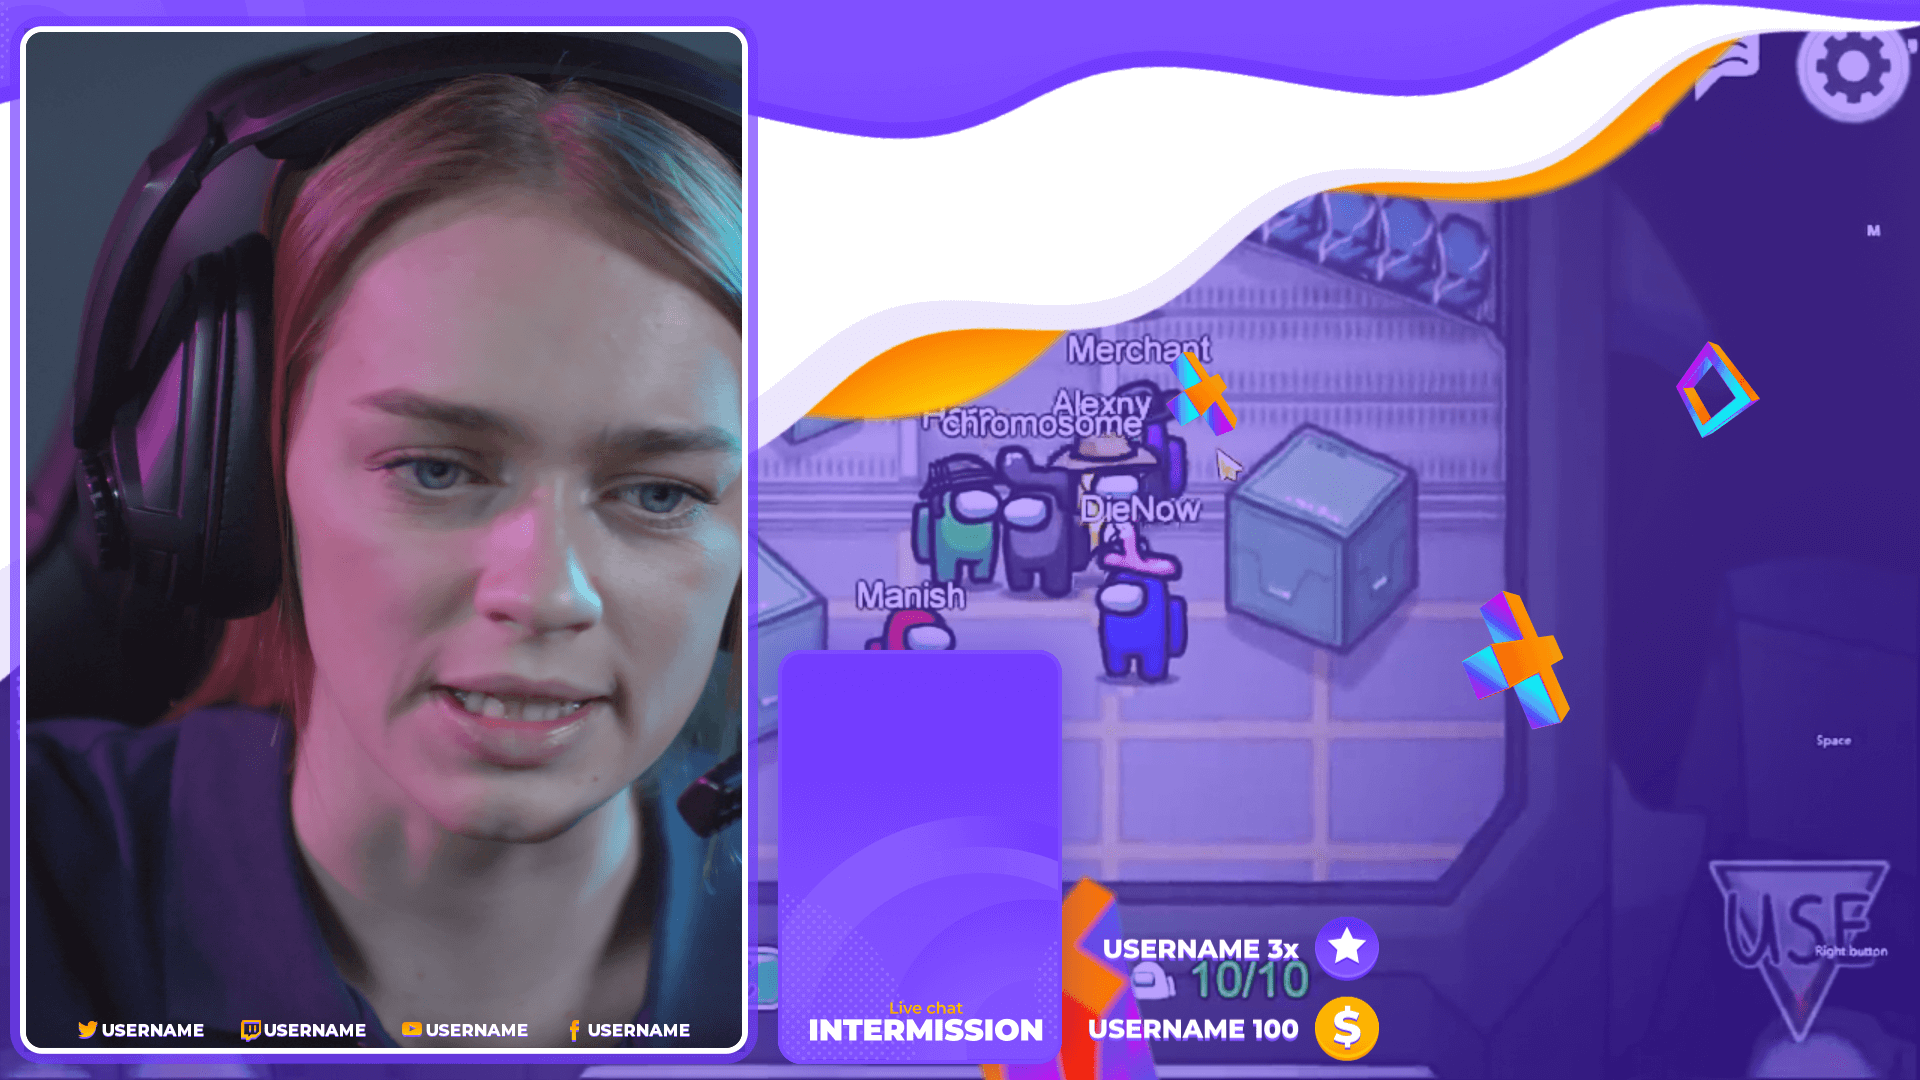 streamer playing among us using purple overlays